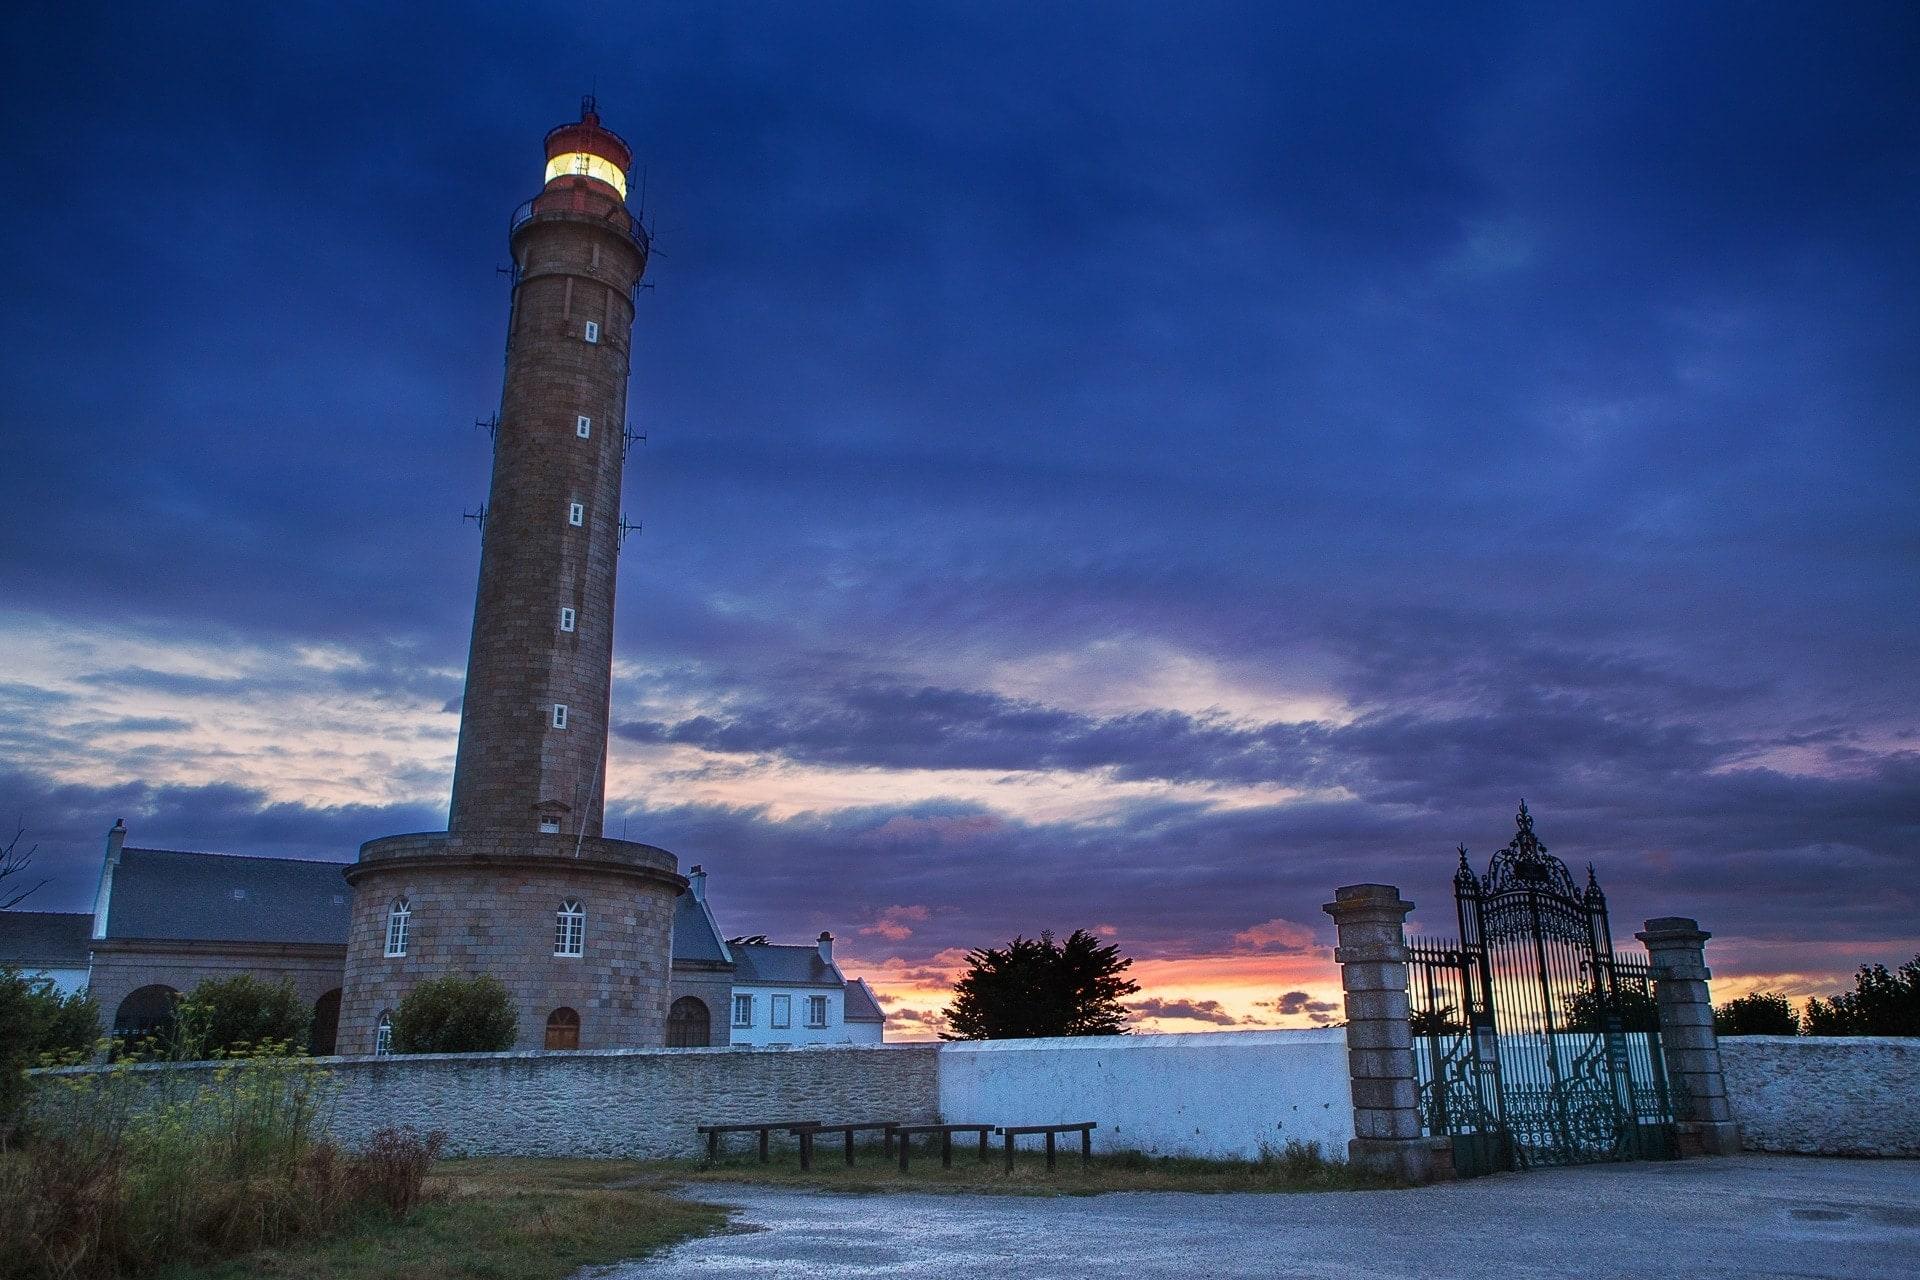 Phare de Goulphar de nuit à Belle-Île-en-mer